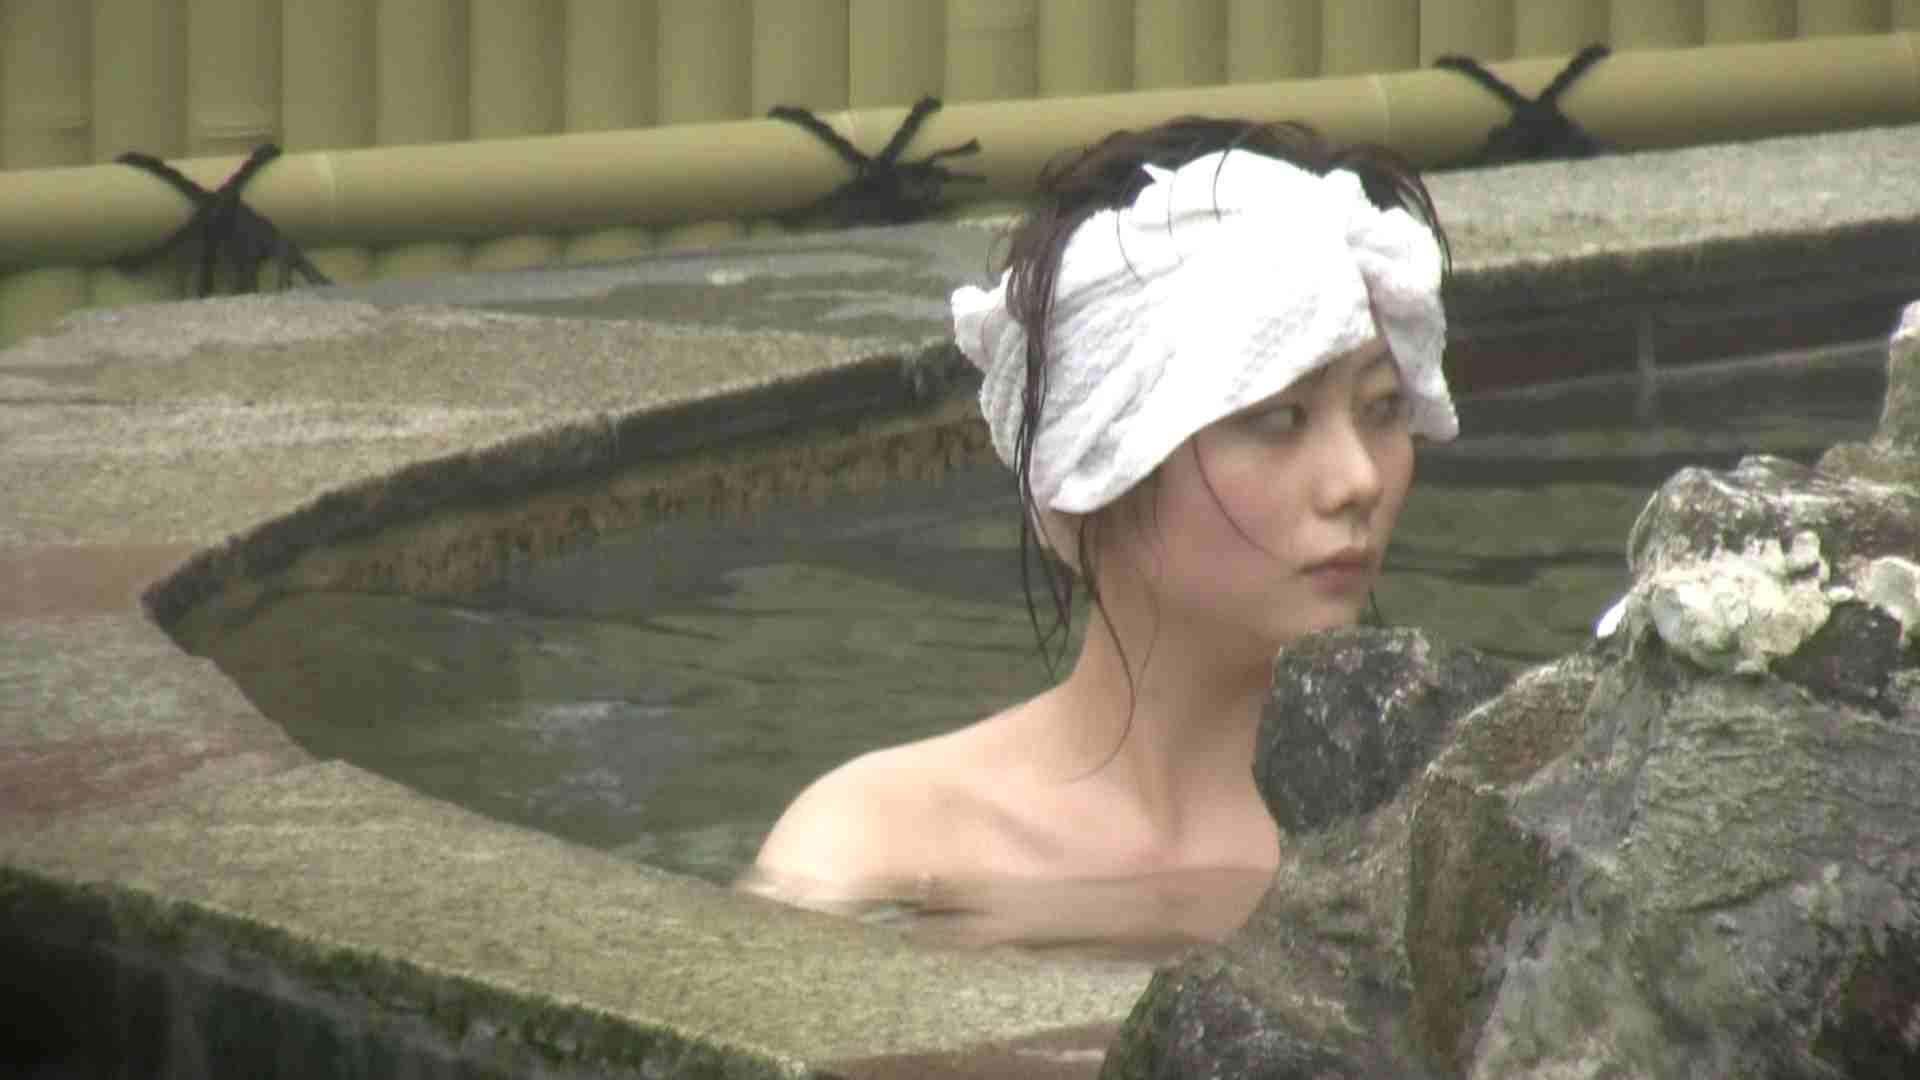 Aquaな露天風呂Vol.147 HなOL | 露天  103pic 44